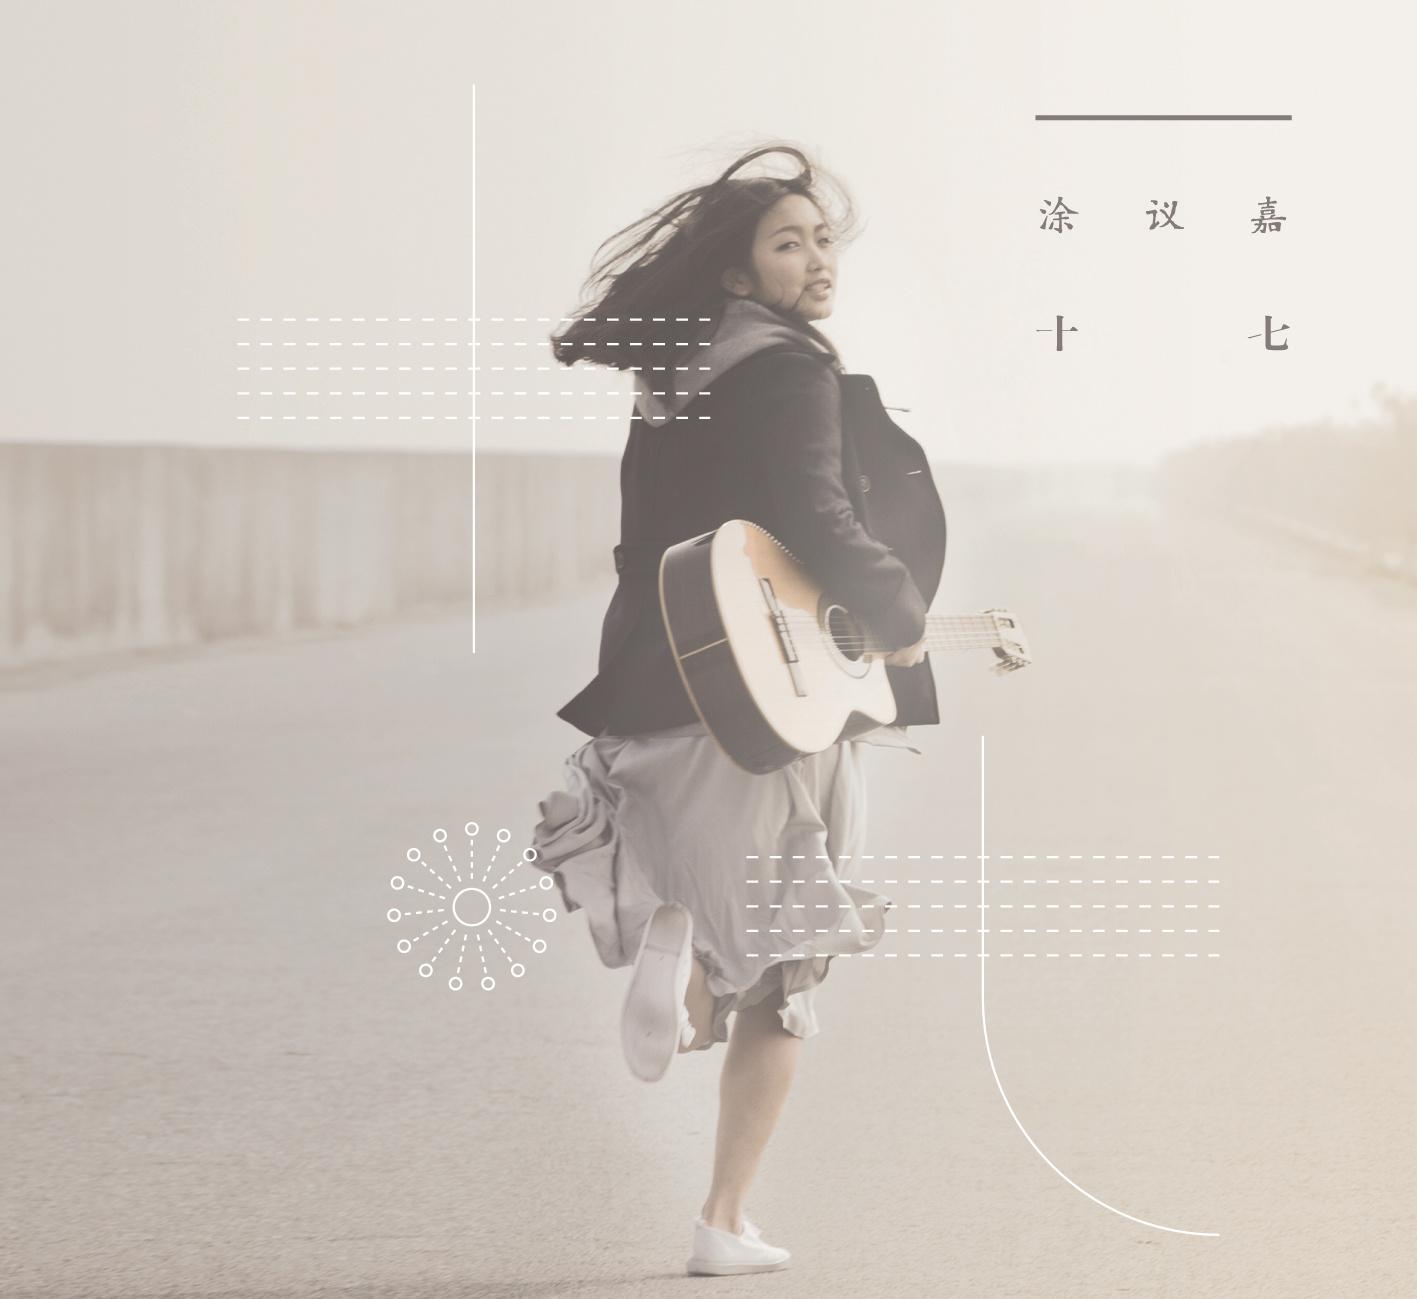 [Album] 十七 - 涂議嘉